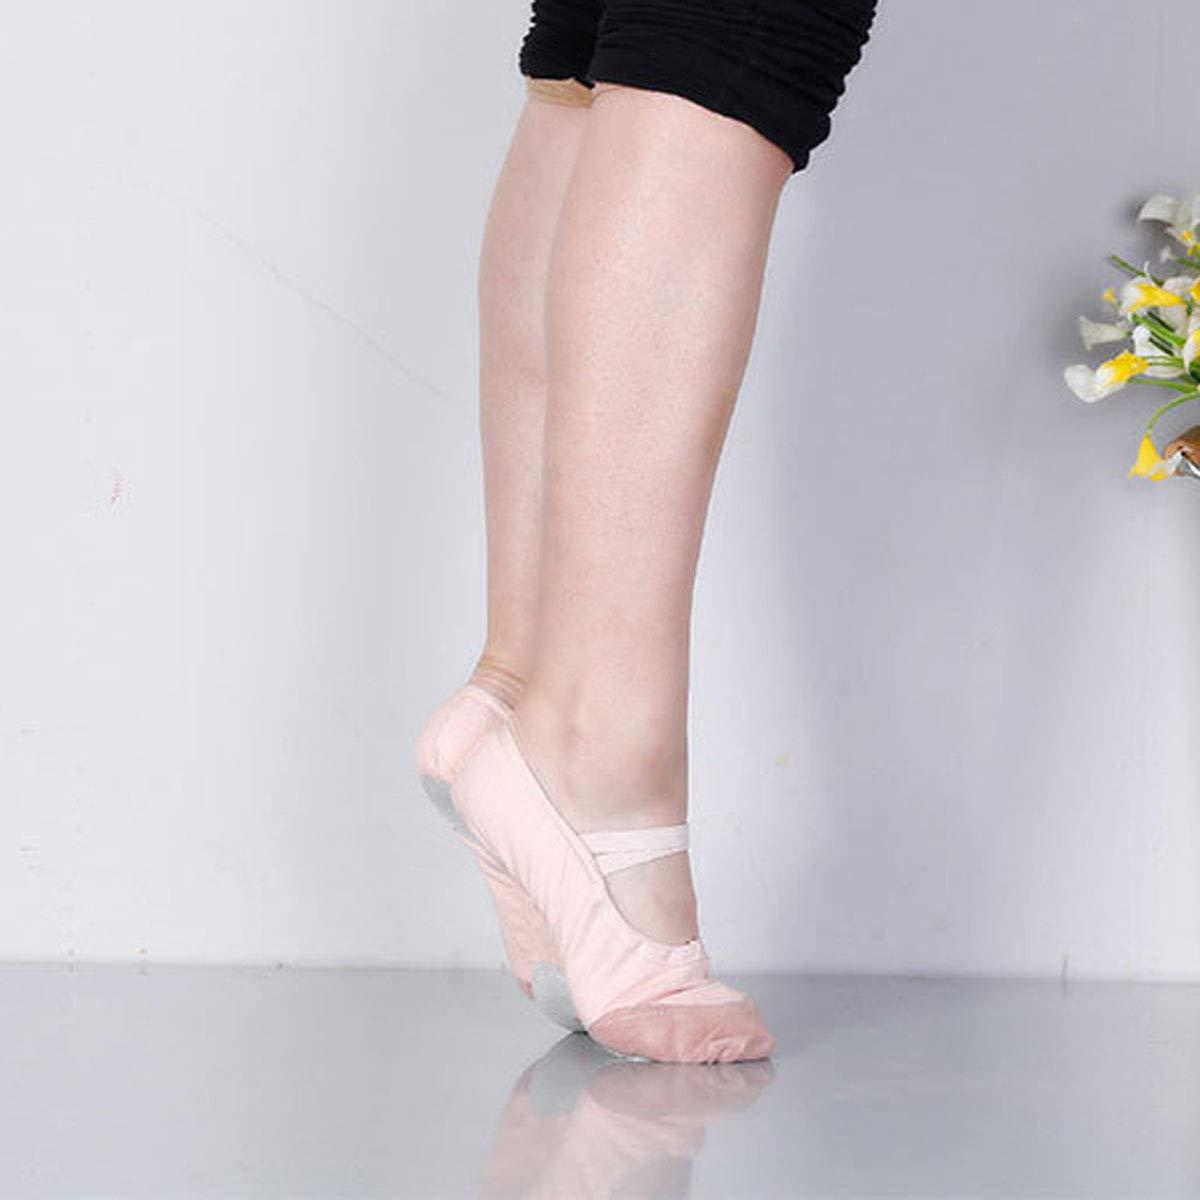 Color : 31 Ballet Dance Yoga Shoes Lady Kids Soft Sole Foot Protection Pointe Shoes